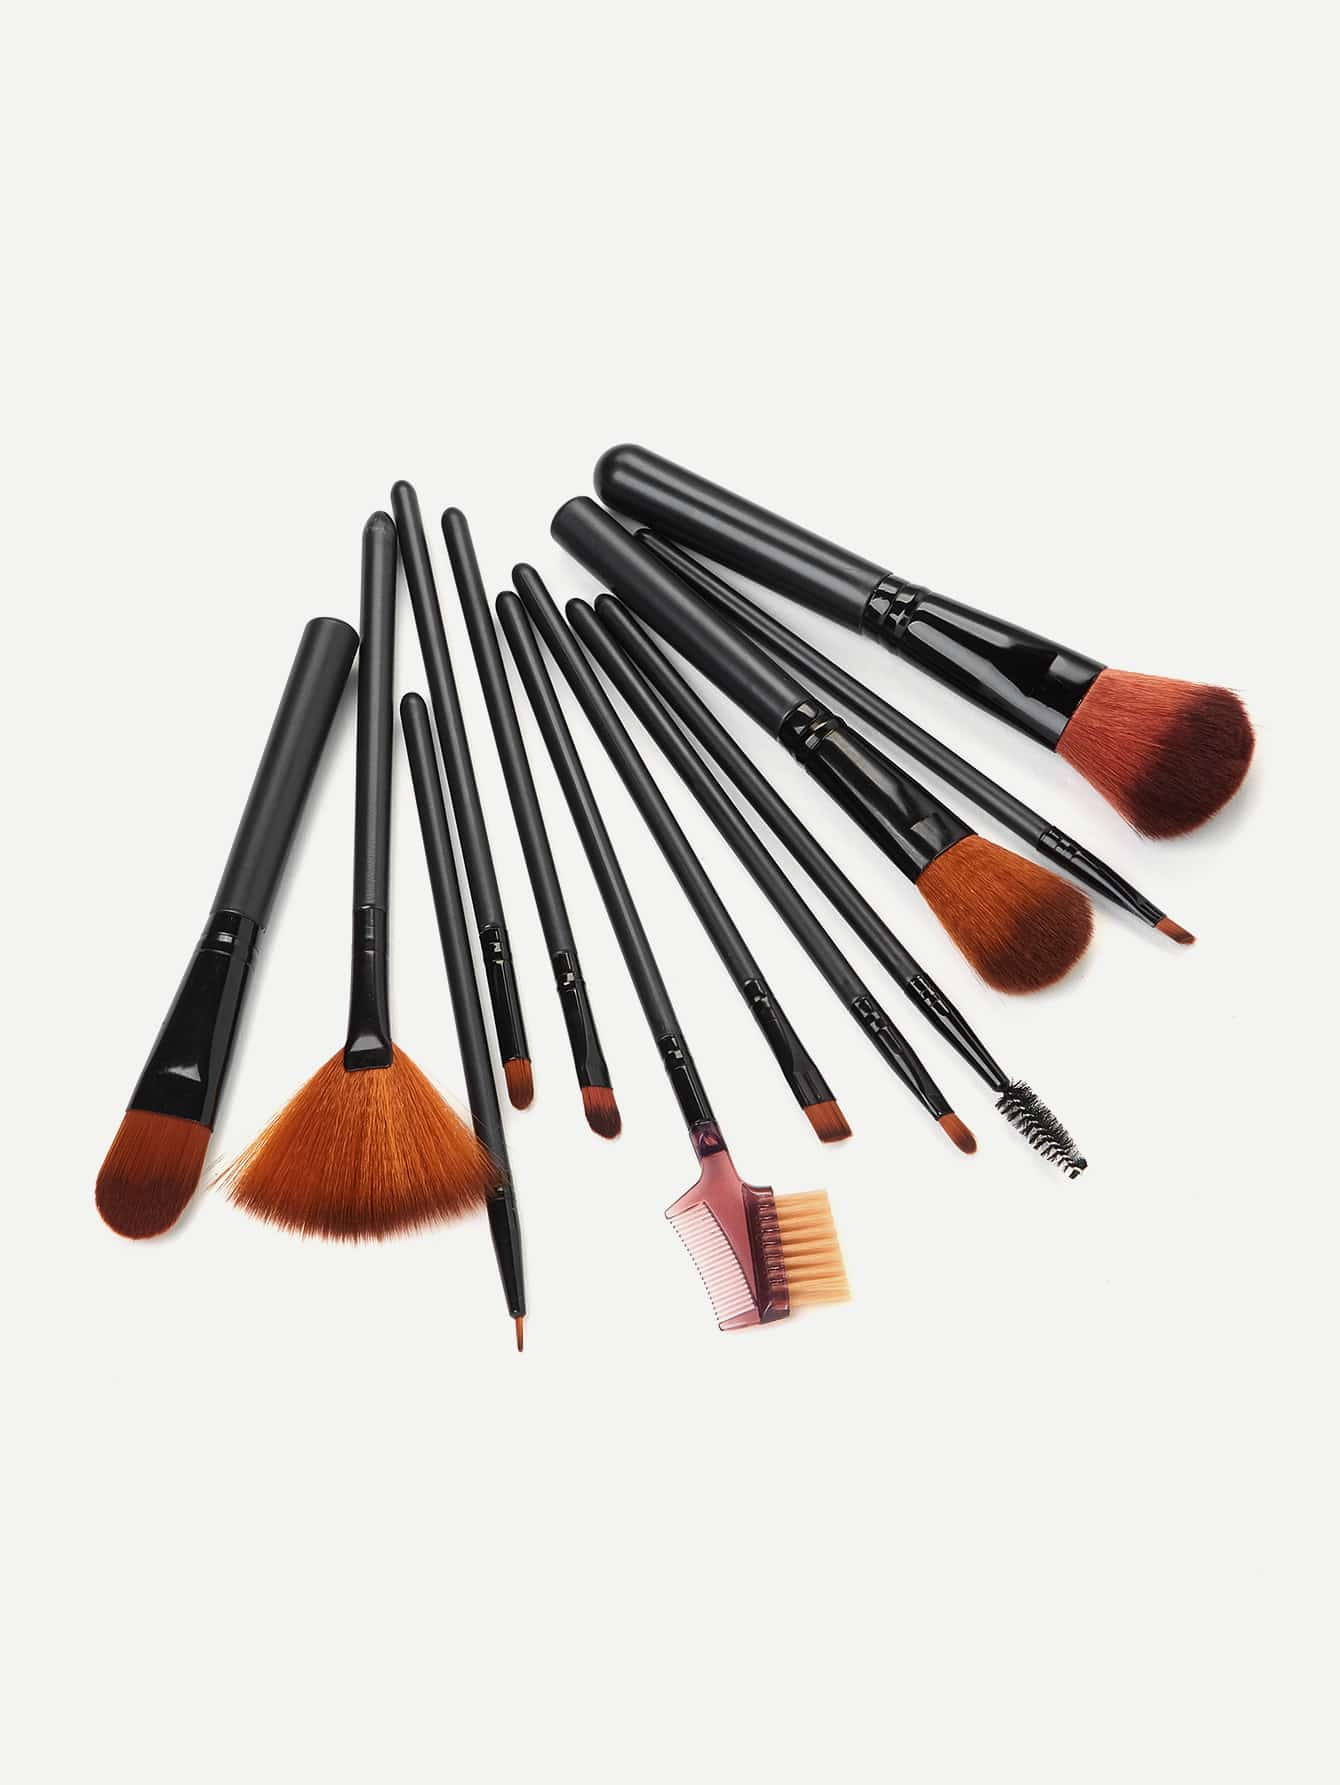 Professional Makeup Brush 12pcs With Bucket